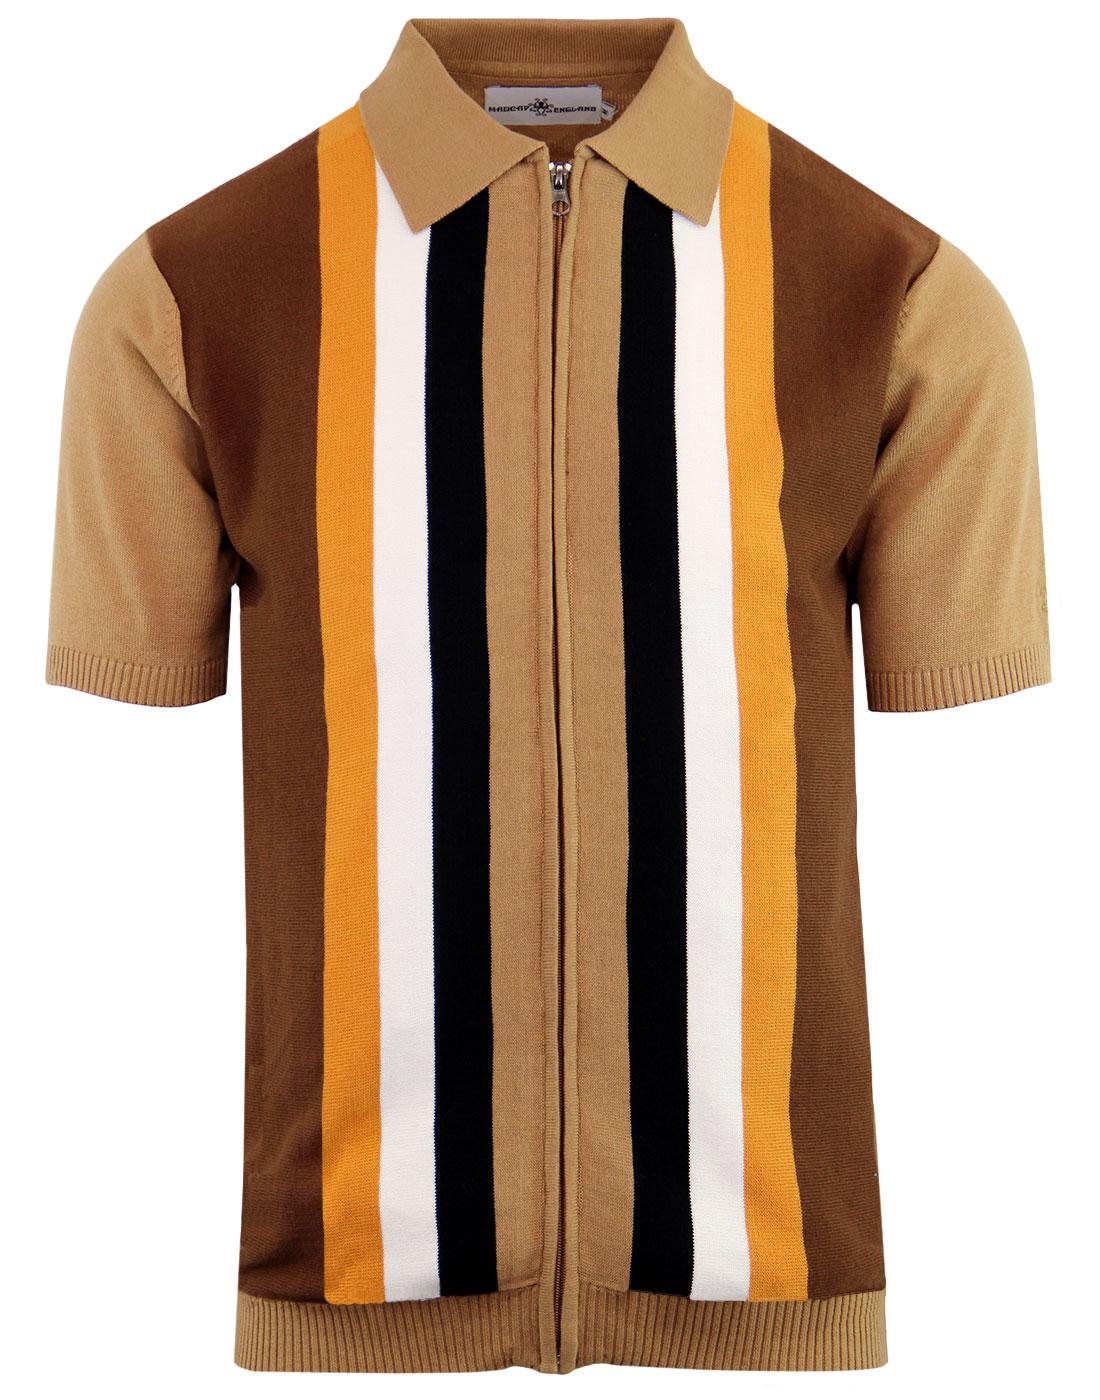 madcap england victor 60s mod stripe polo cardigan